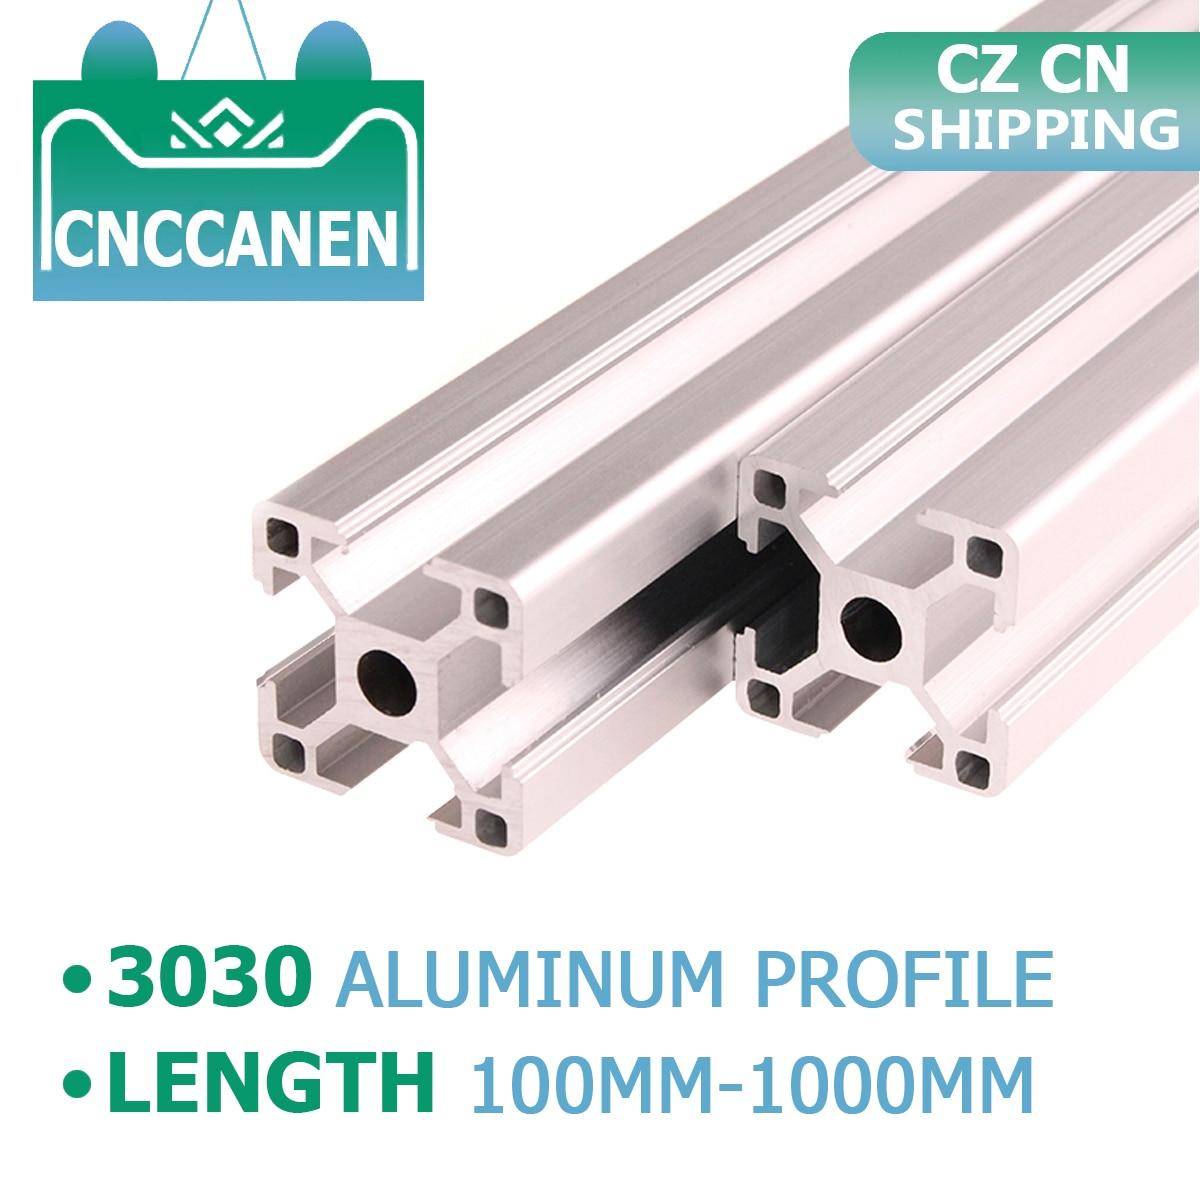 CZ CN Shipping 2PCS 3030 Aluminum Profile Extrusion 100mm-1000mm Length European Standard Anodized For CNC 3D Printer Parts DIY